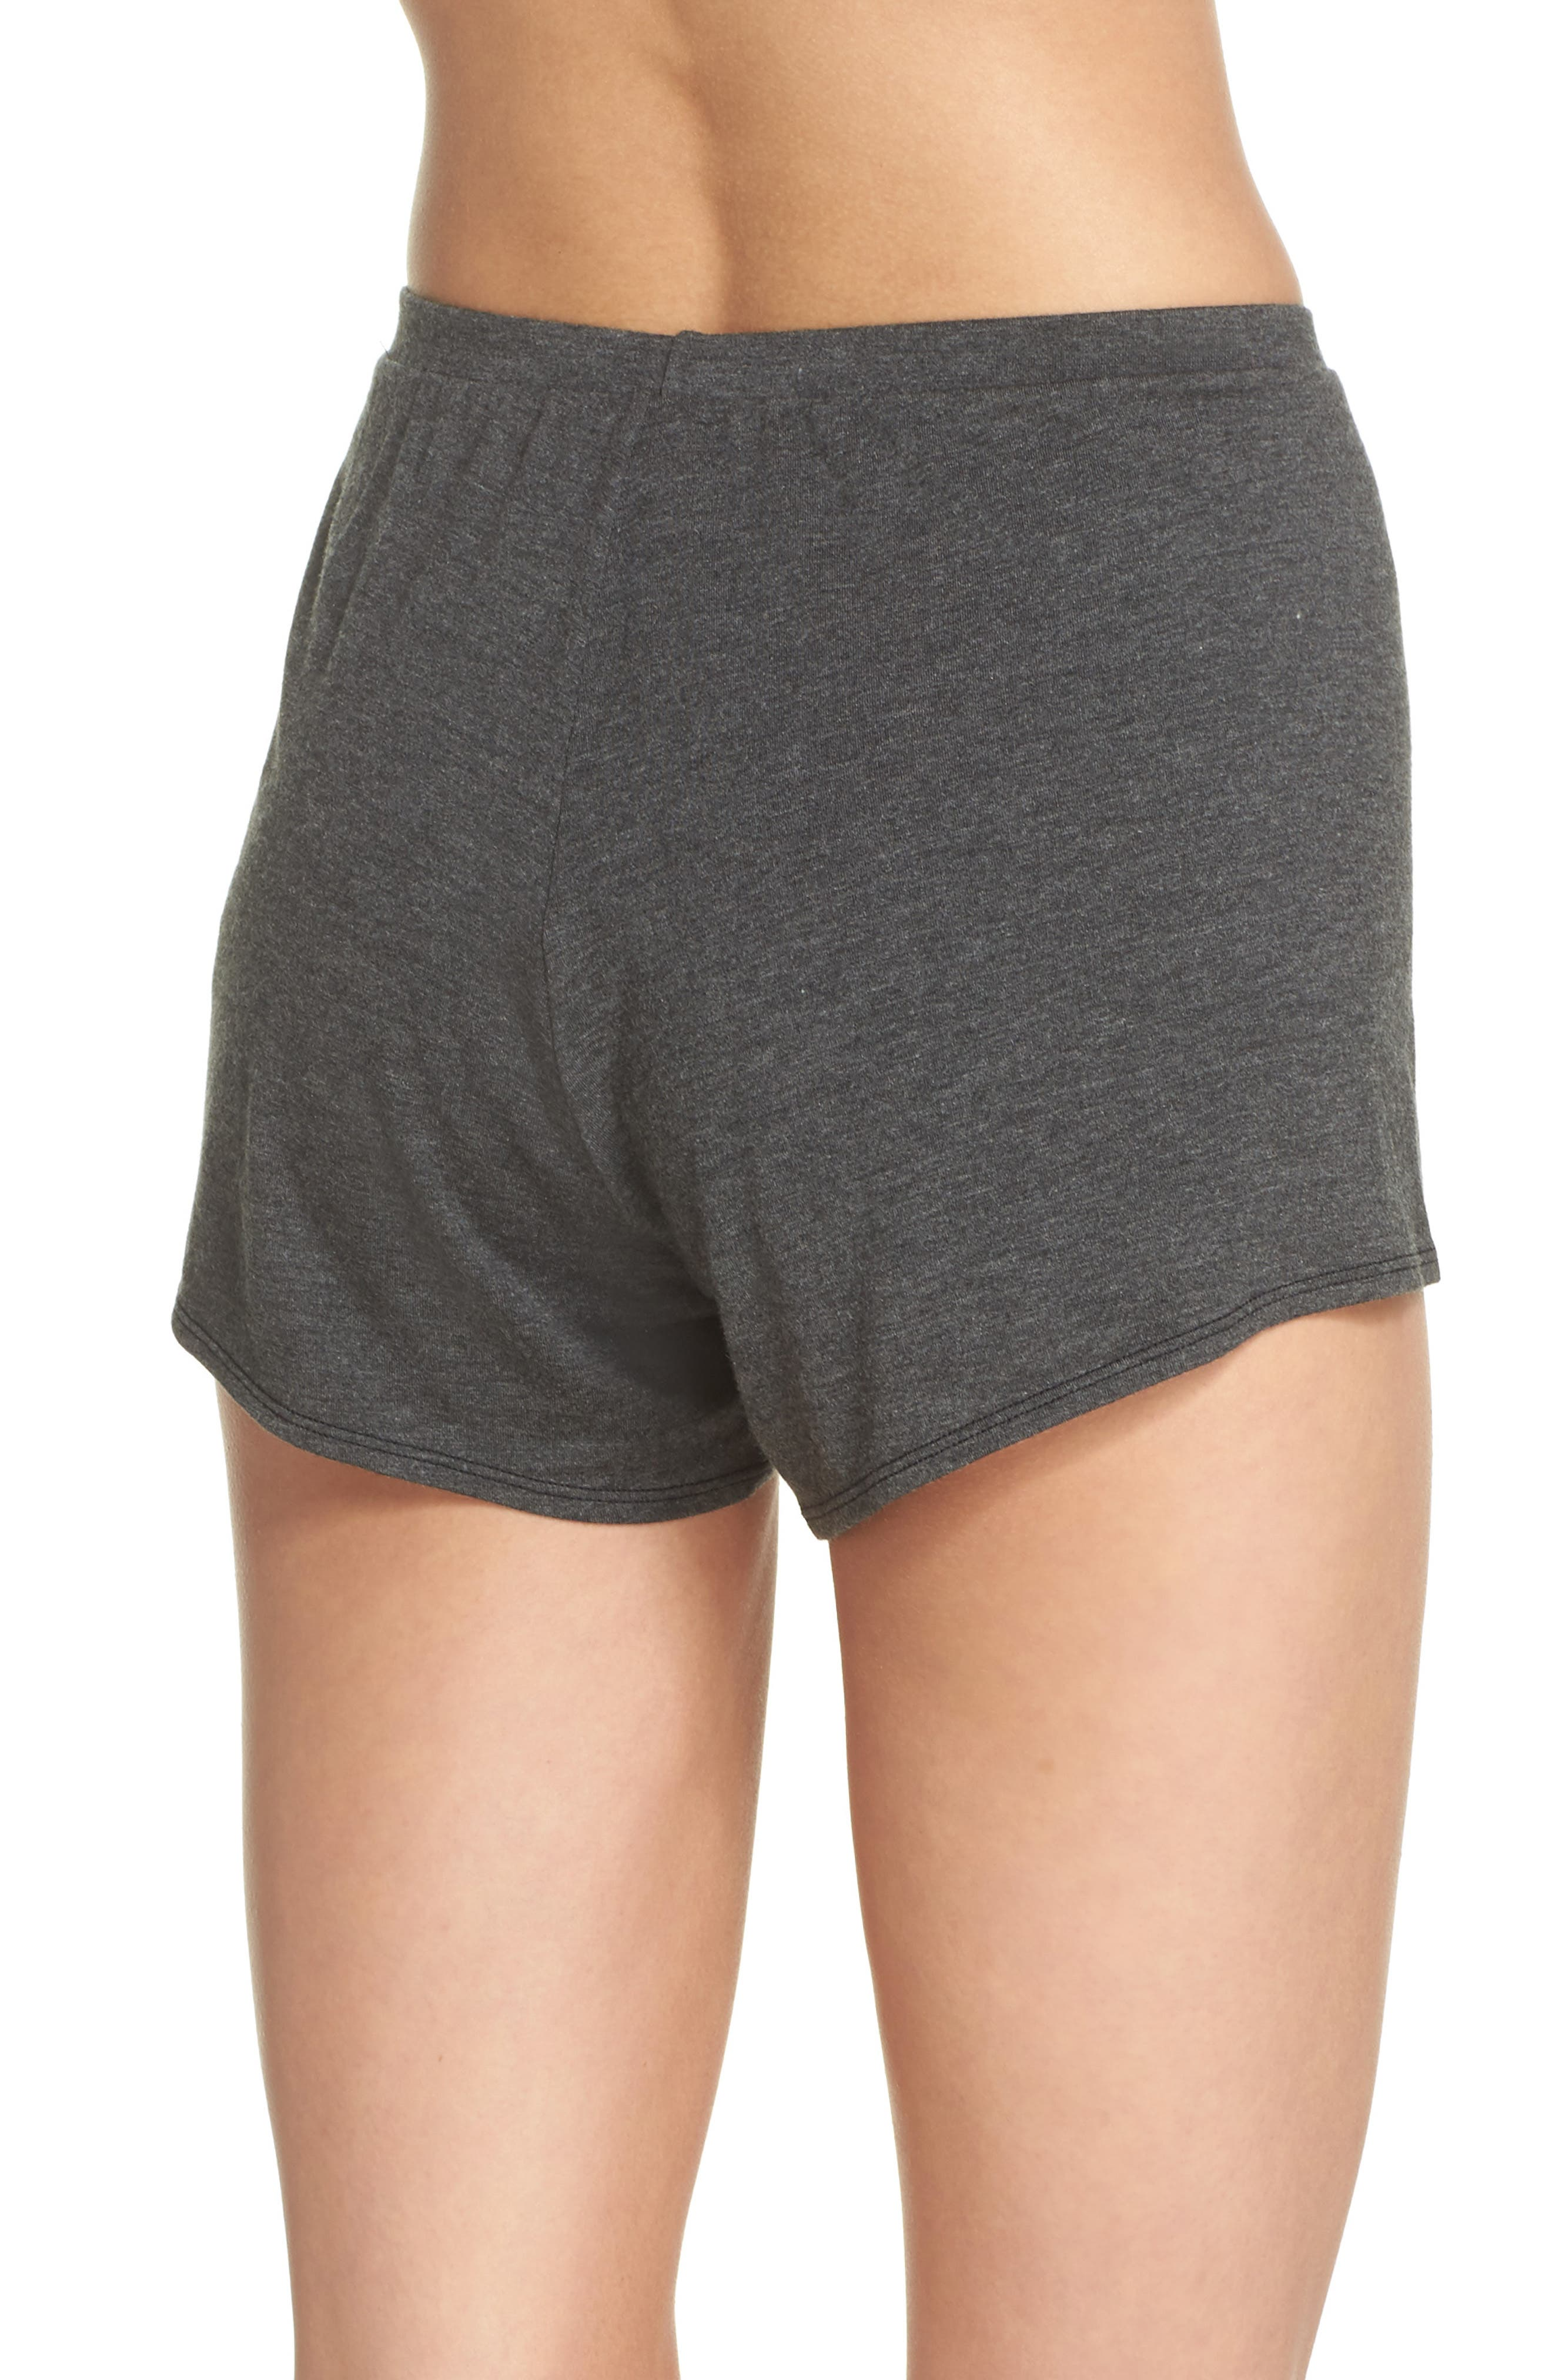 Undressed Pajama Shorts,                             Alternate thumbnail 2, color,                             001